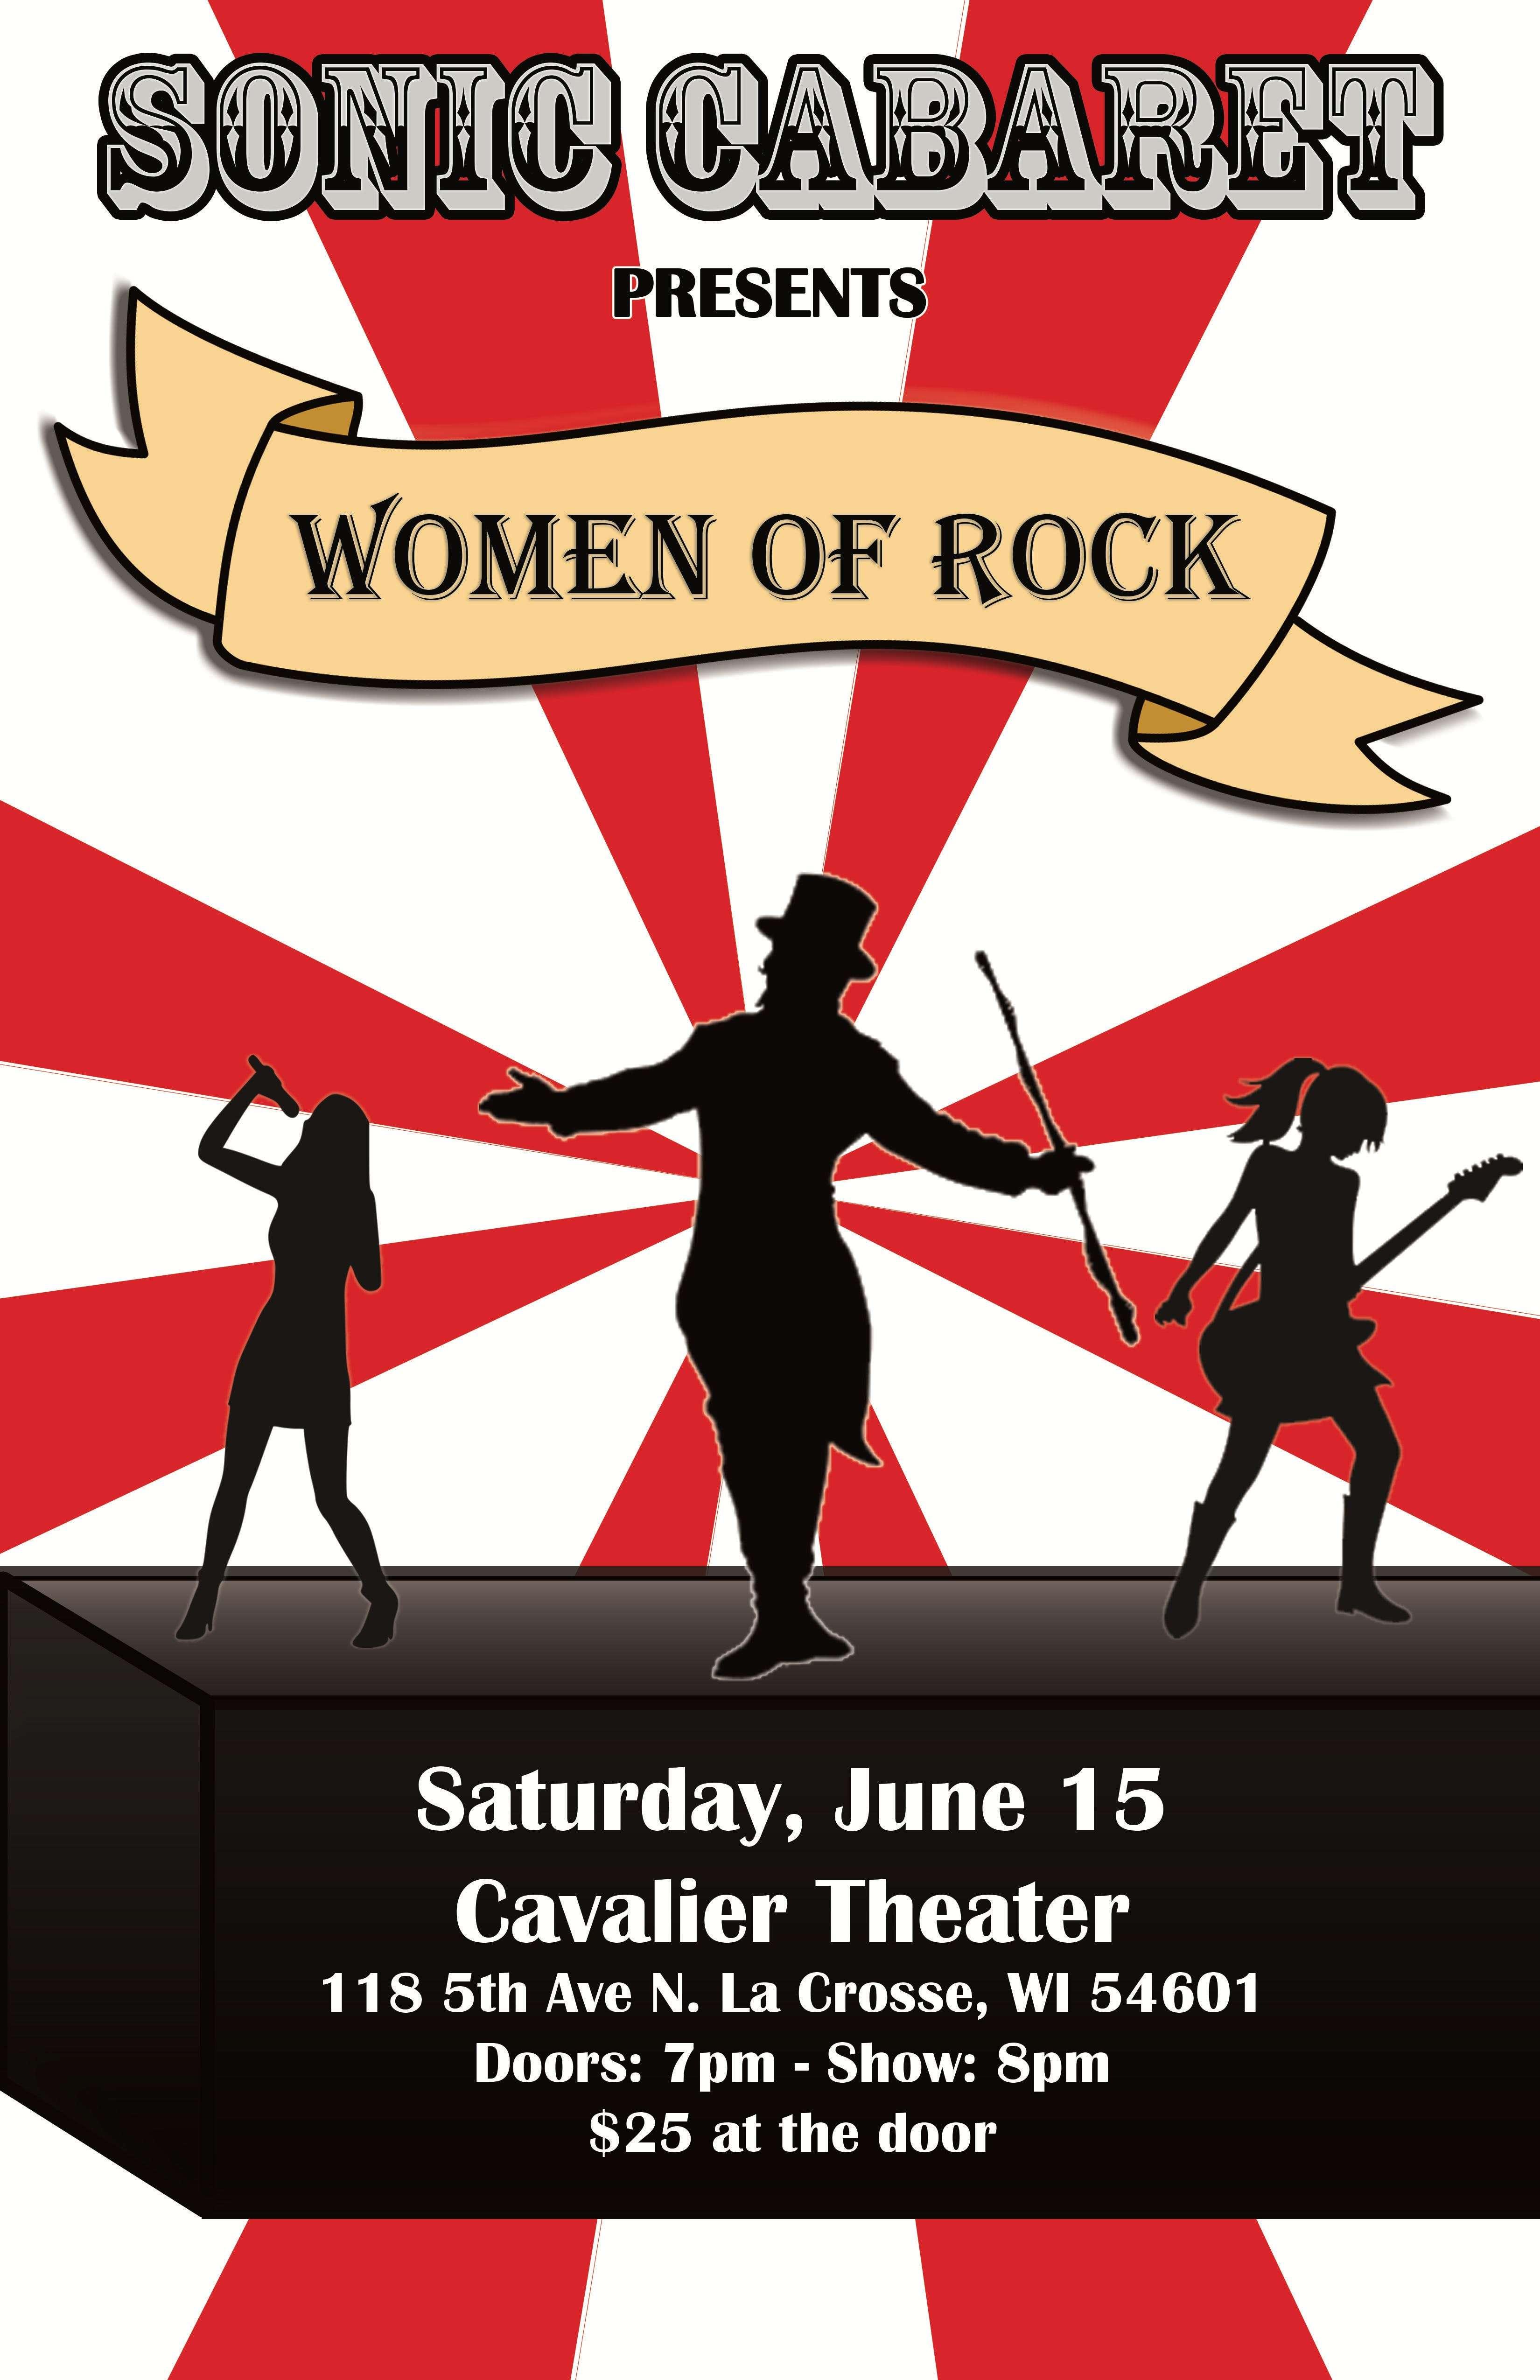 b65781324 Sonic Cabaret Presents Women of Rock at Cavalier Theater